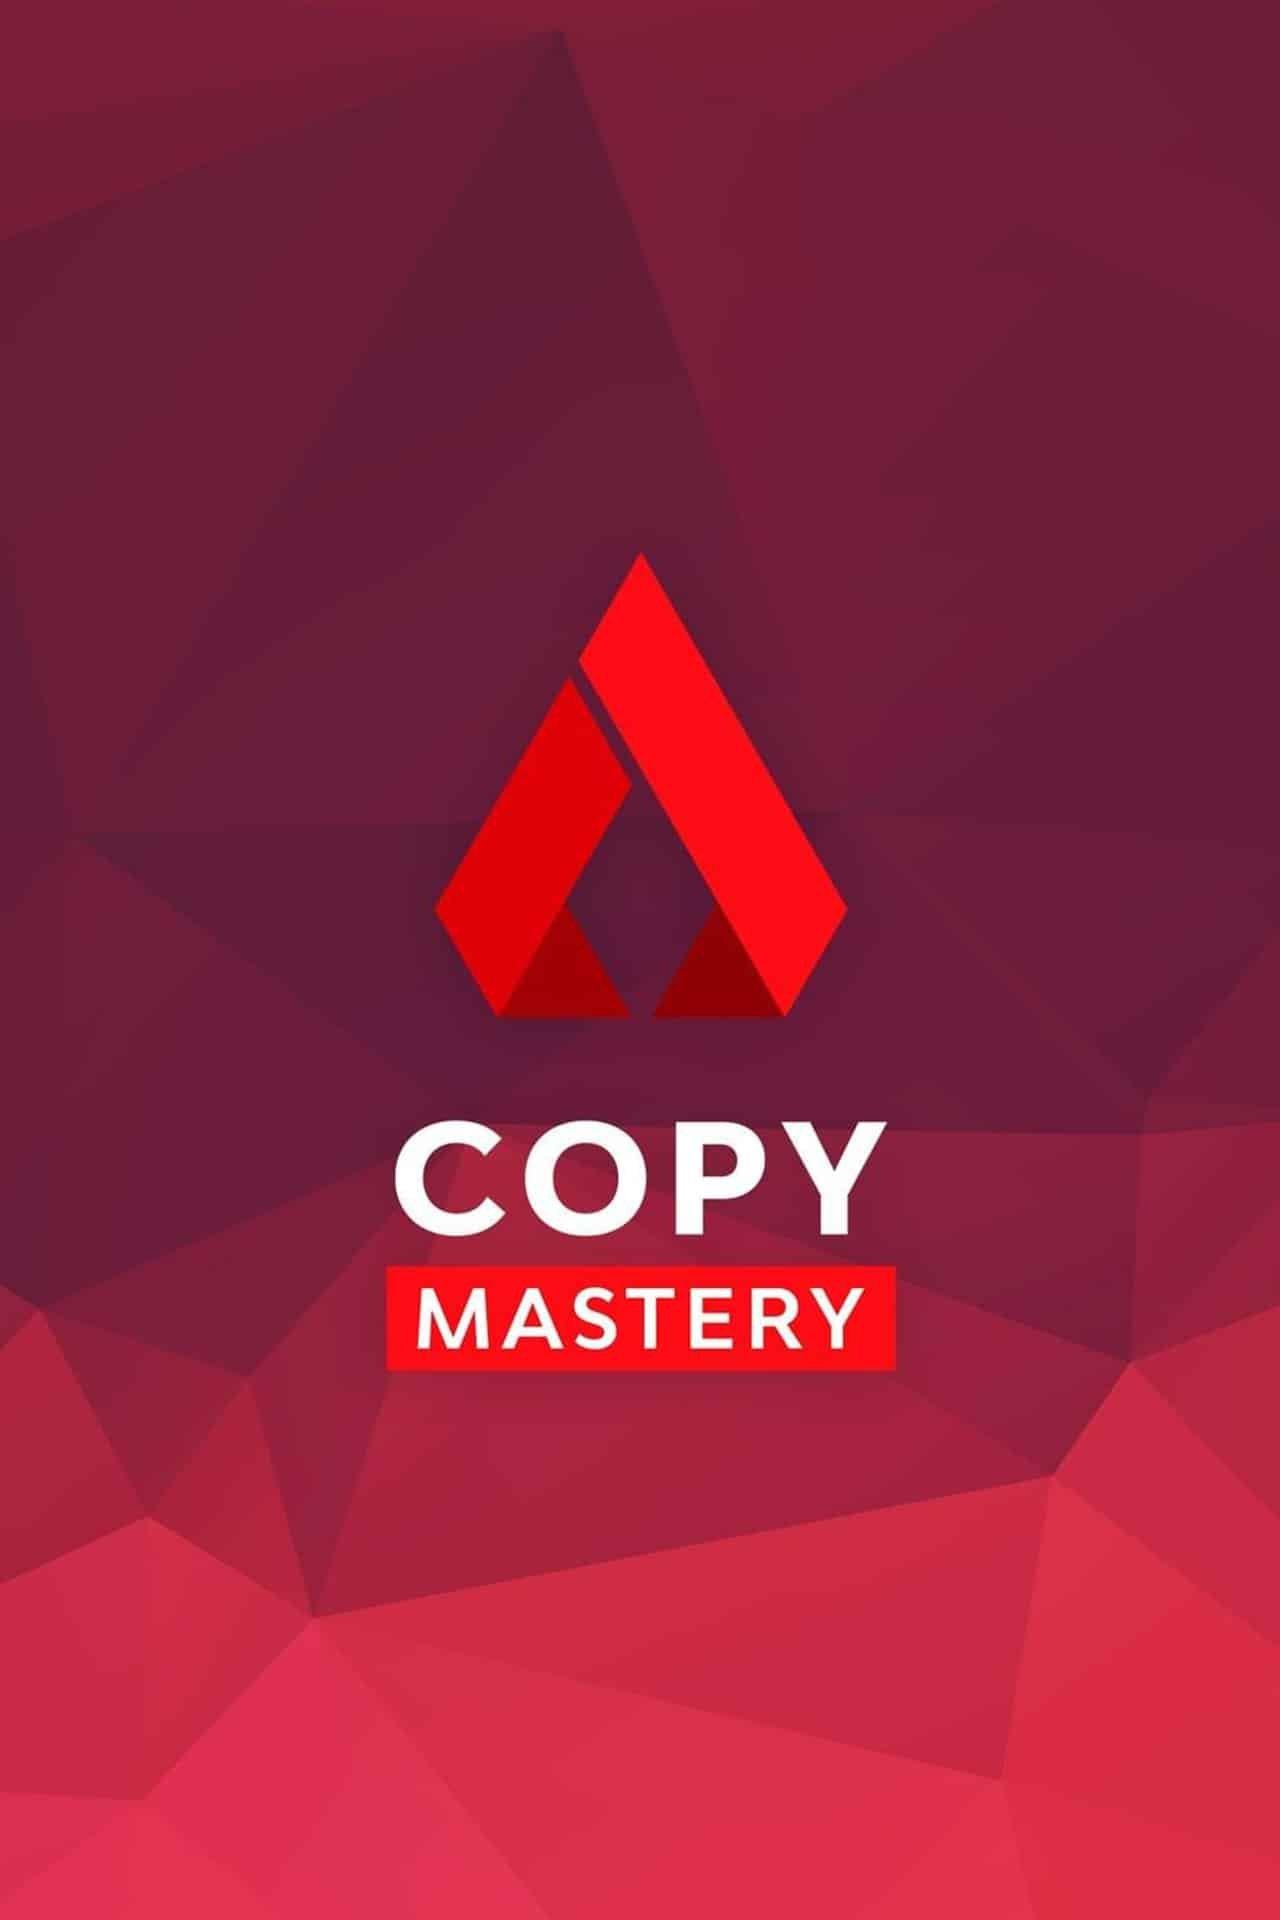 copymastery